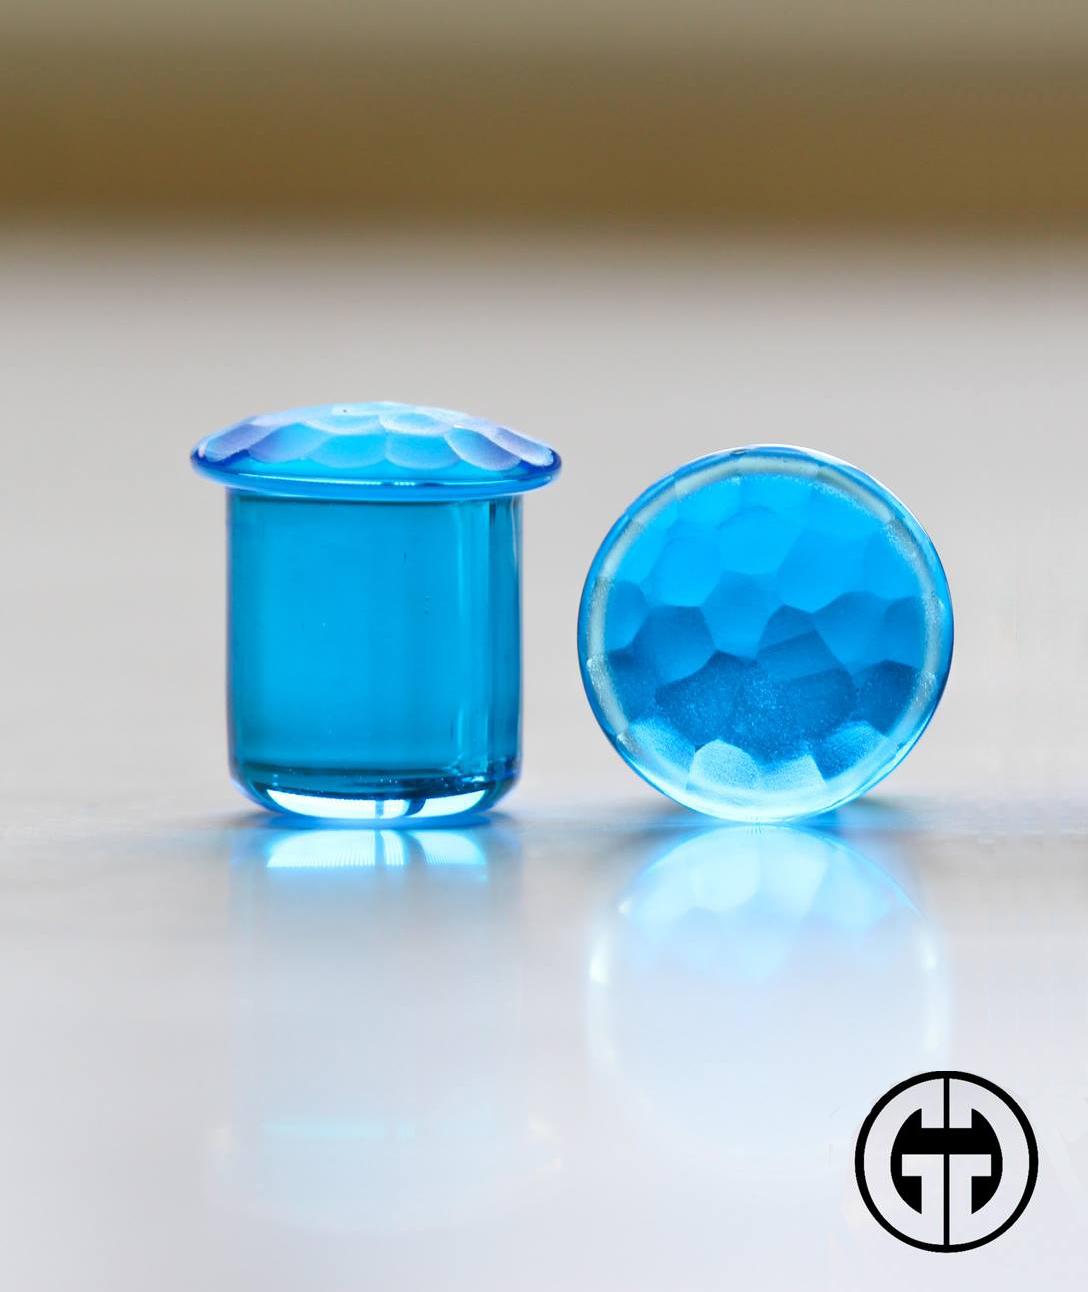 Pair of Honey Glass Single Flared Simple Plugs